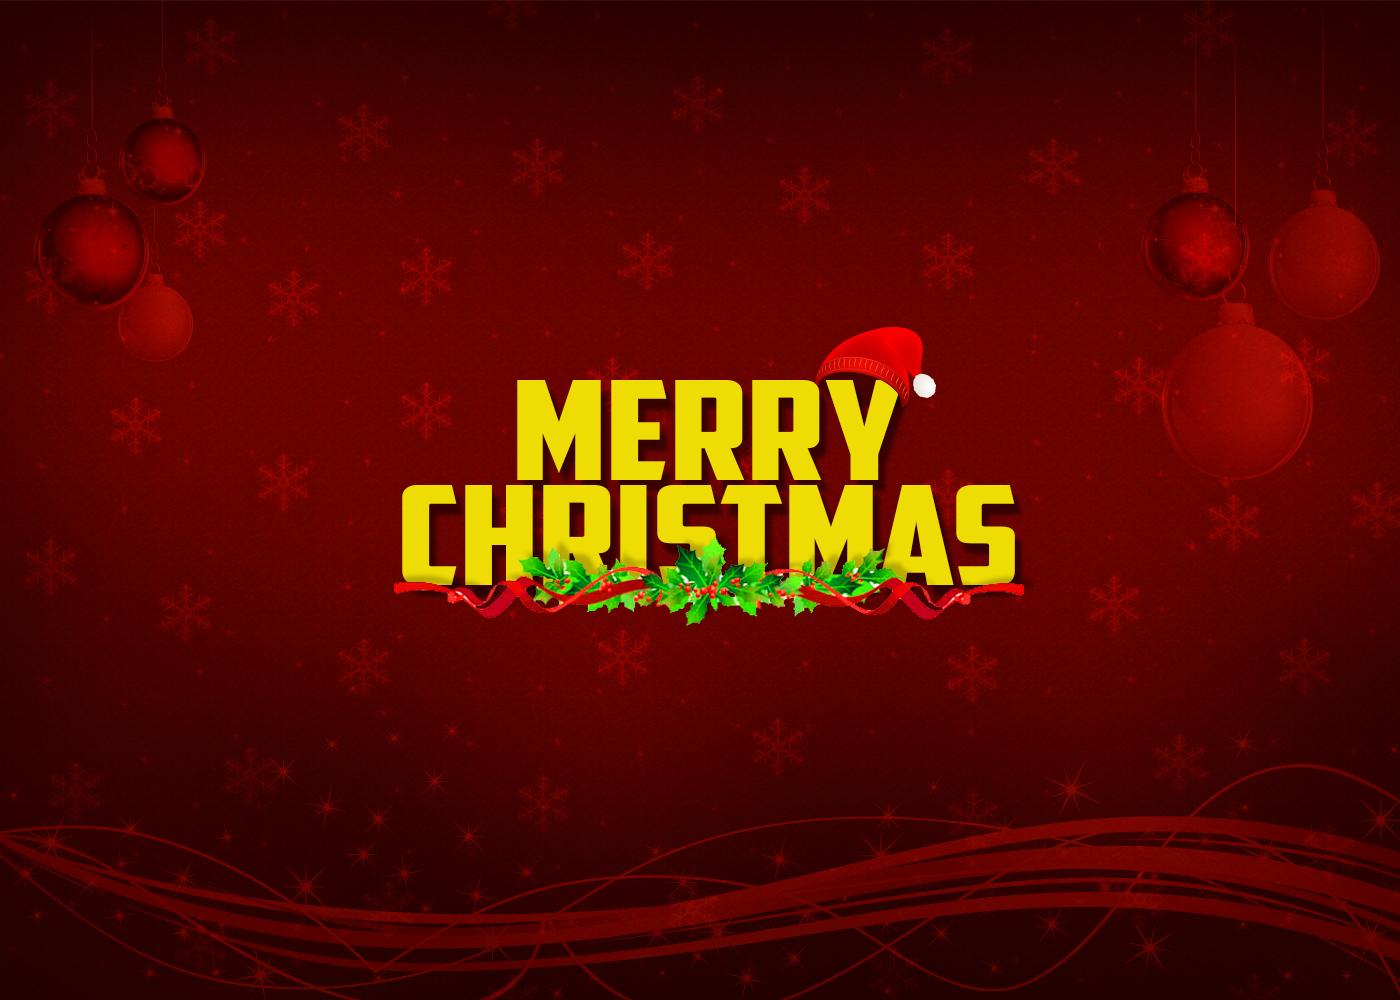 merry christmas hd wallpaper 2000